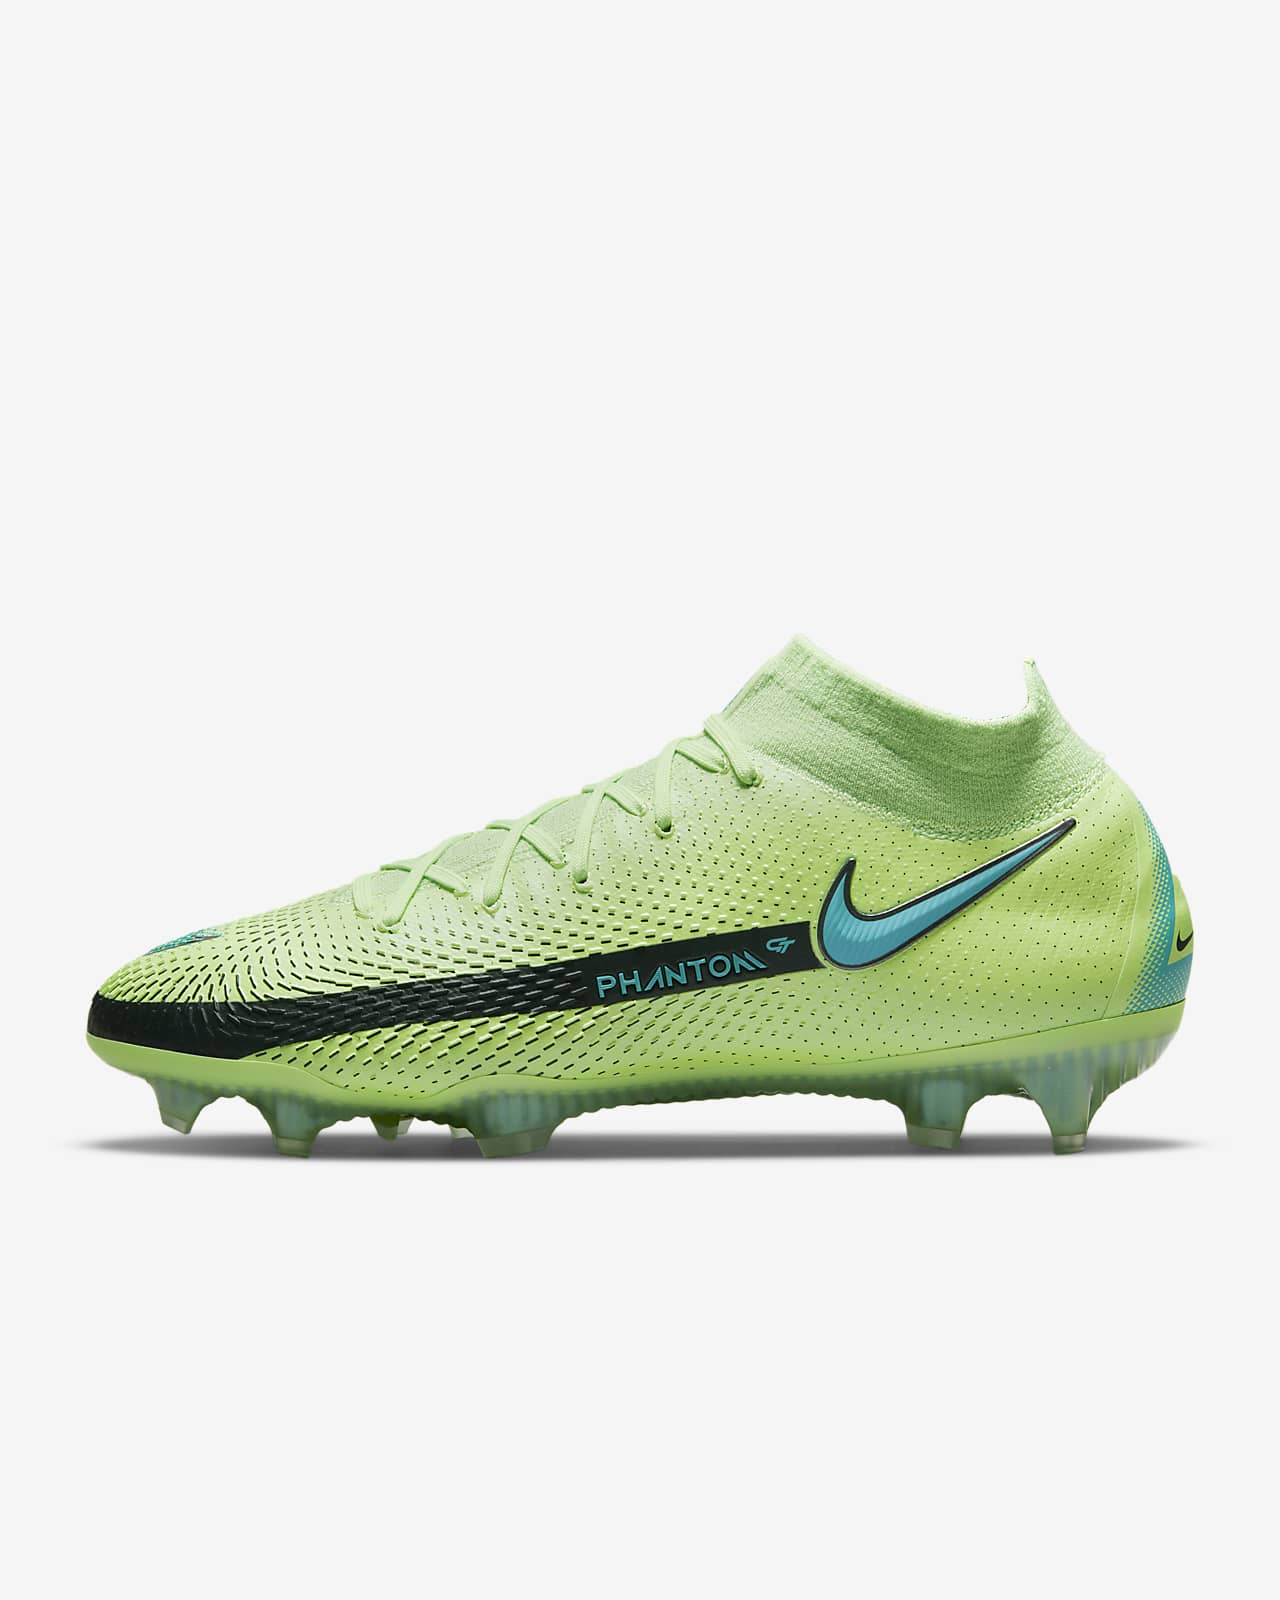 Nike Phantom GT Elite Dynamic Fit FG Firm-Ground Soccer Cleats